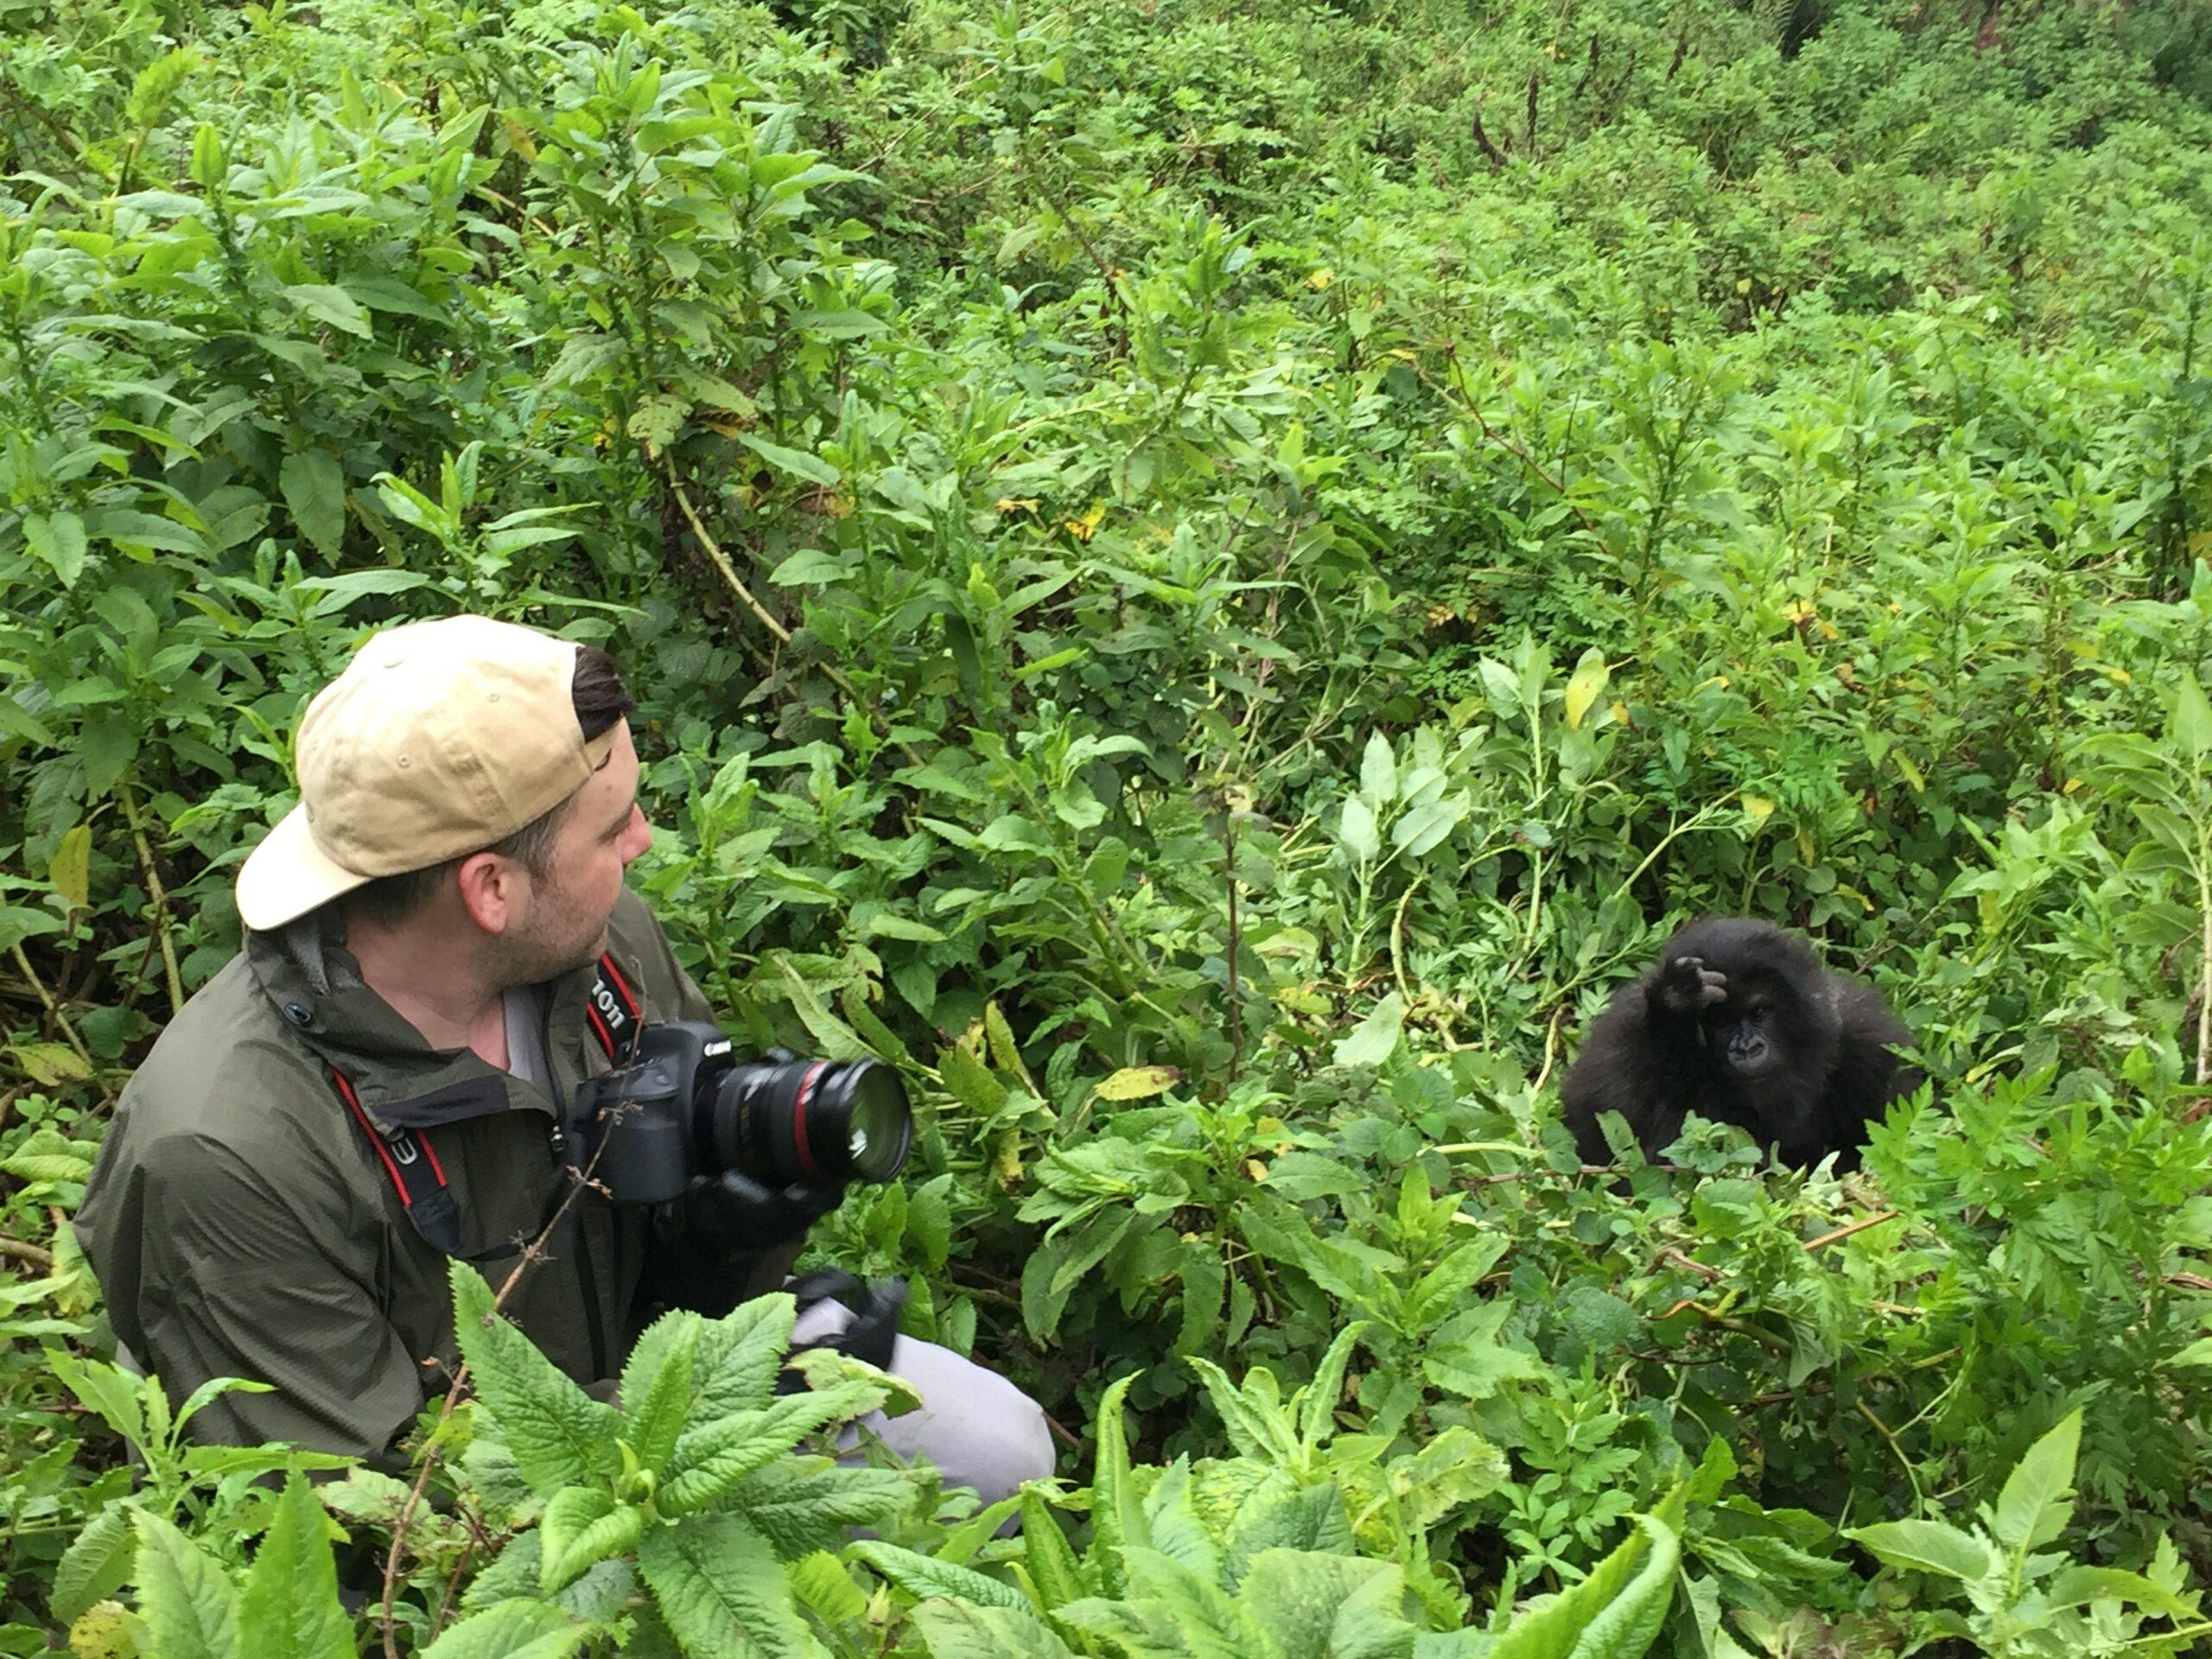 gorilla and man in Rwanda